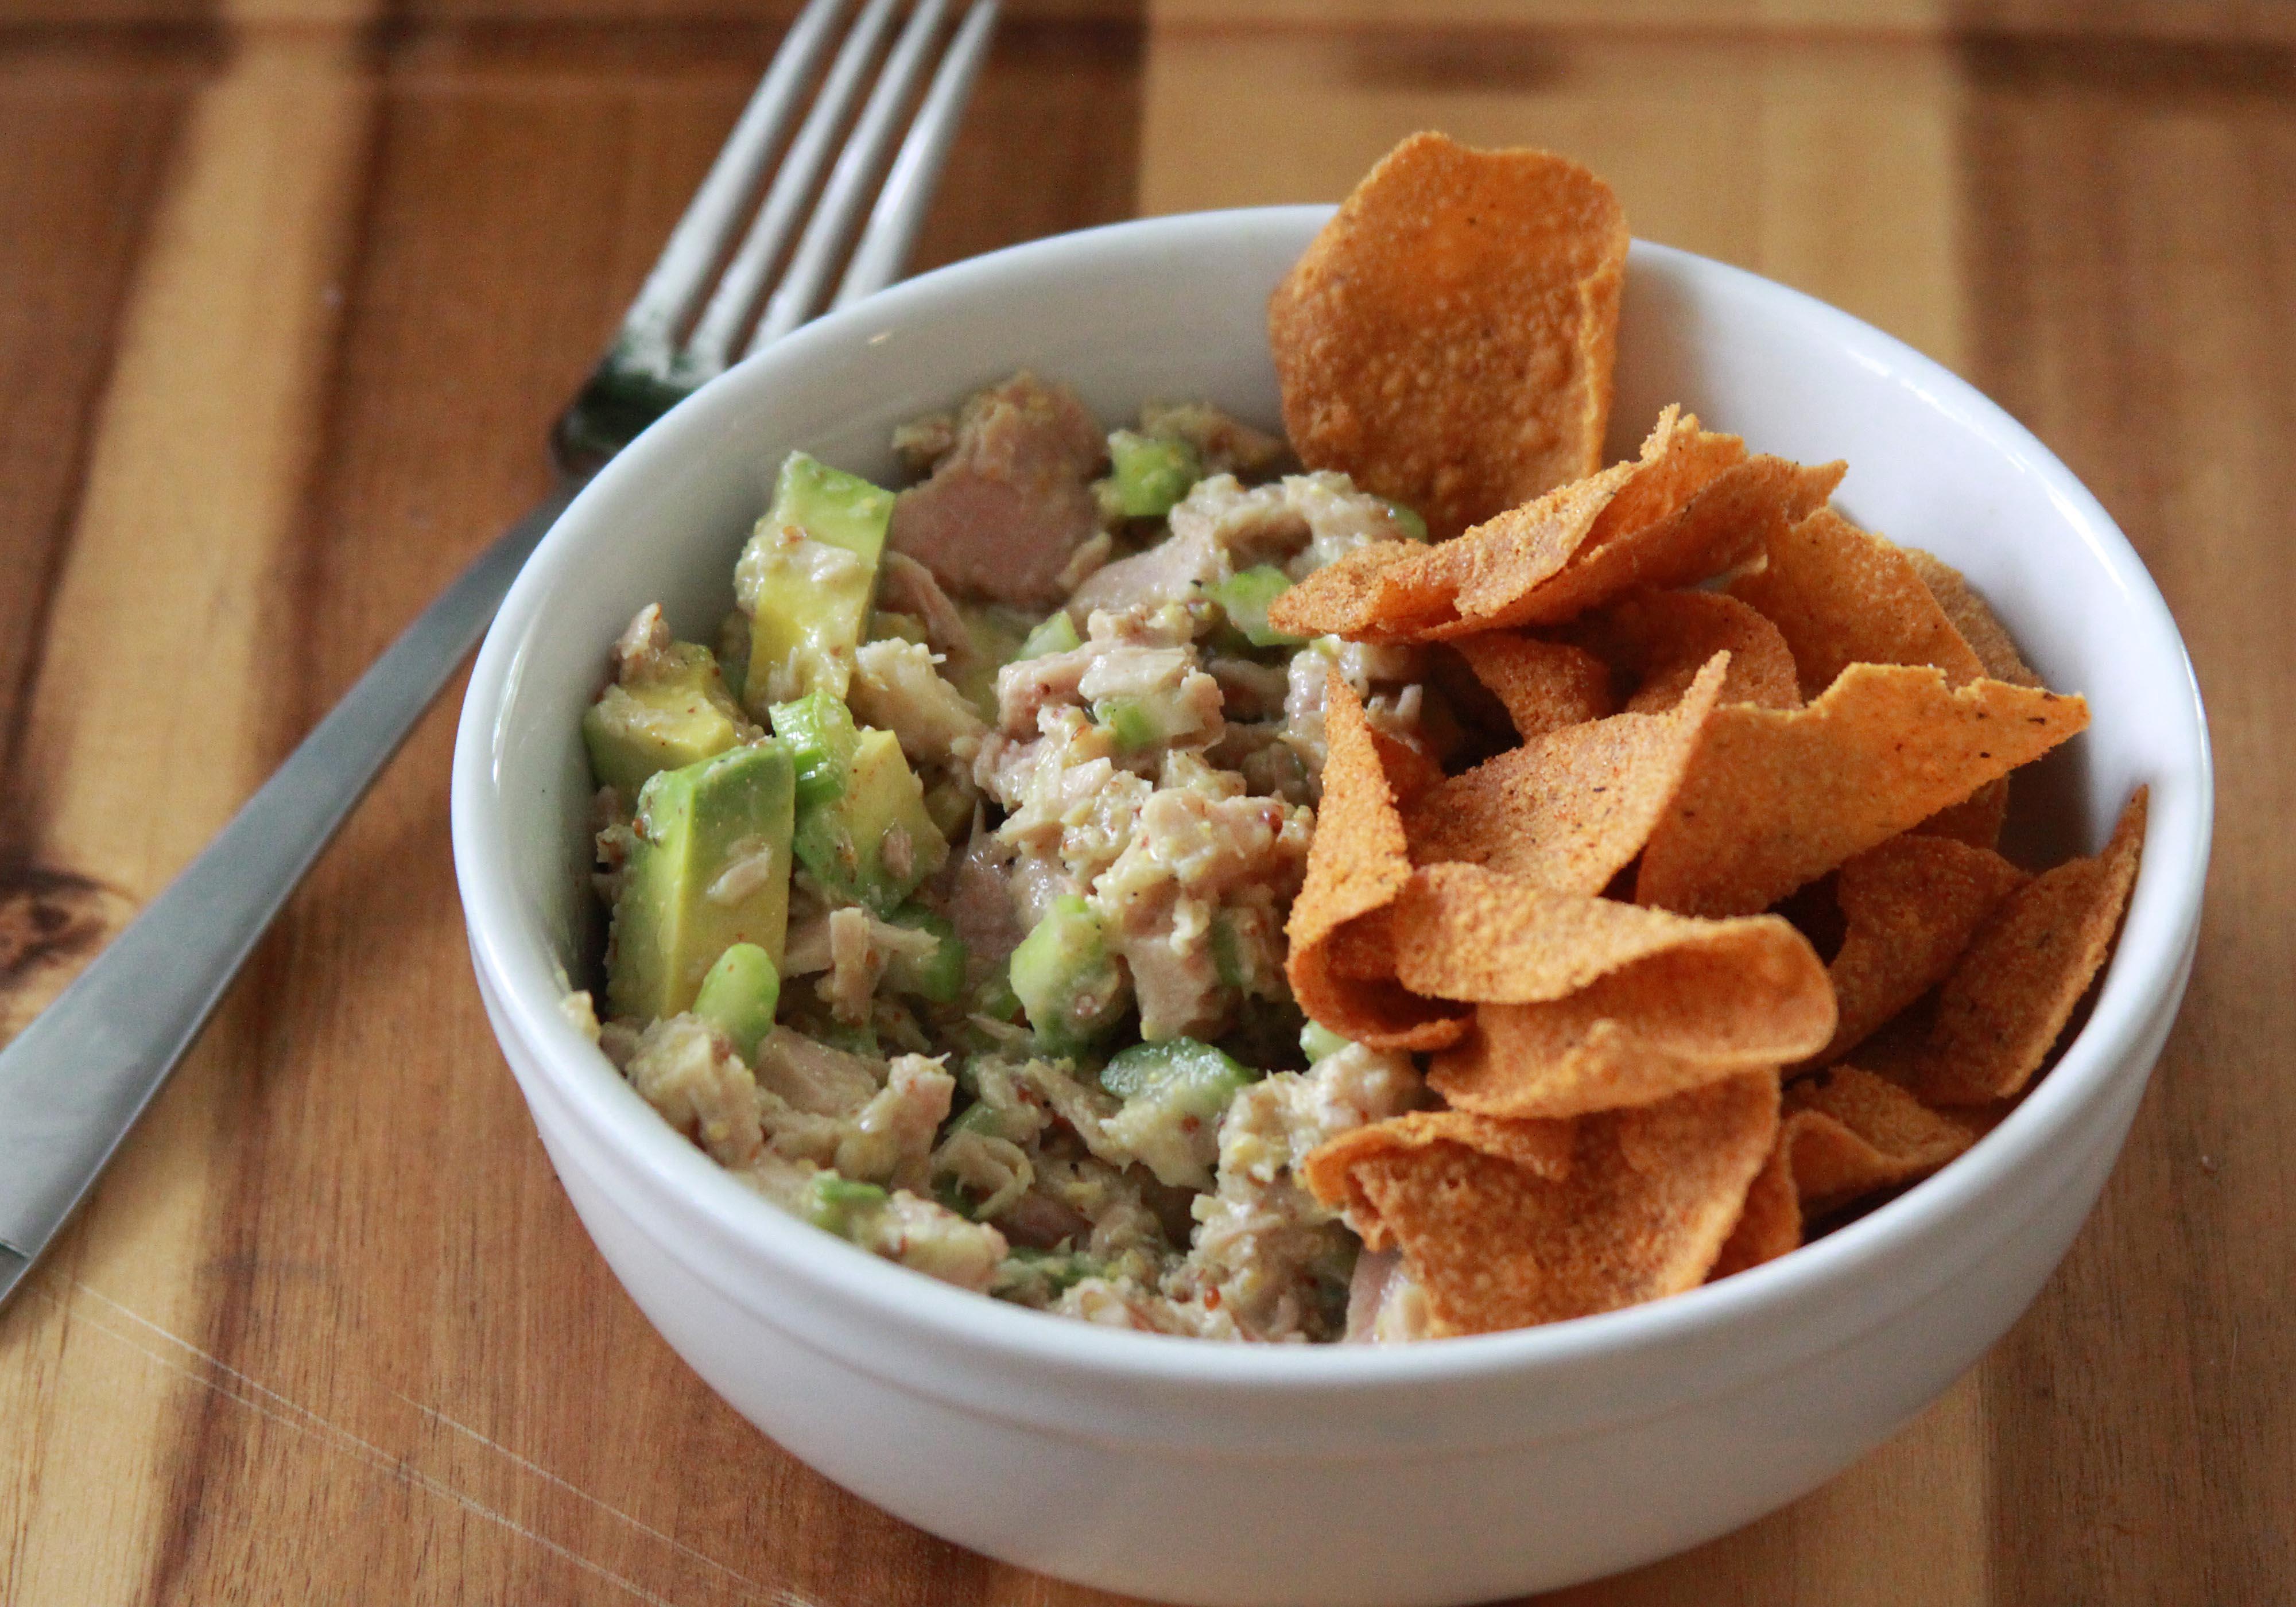 California Style Tuna Salad (Mayo-Free!) | Espresso and Cream